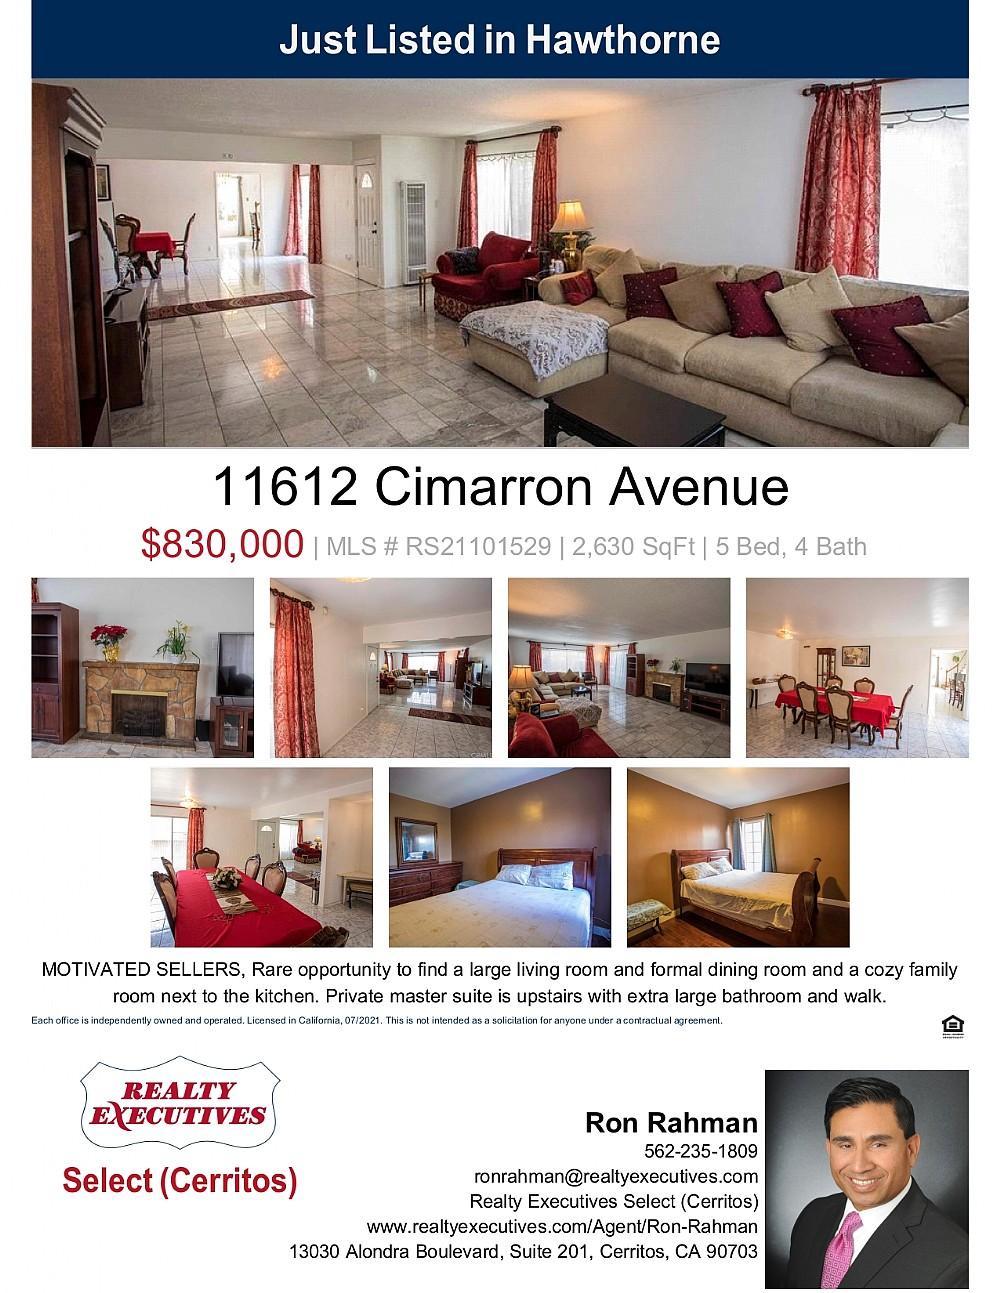 Elfyer - Hawthorne, CA House - For Sale